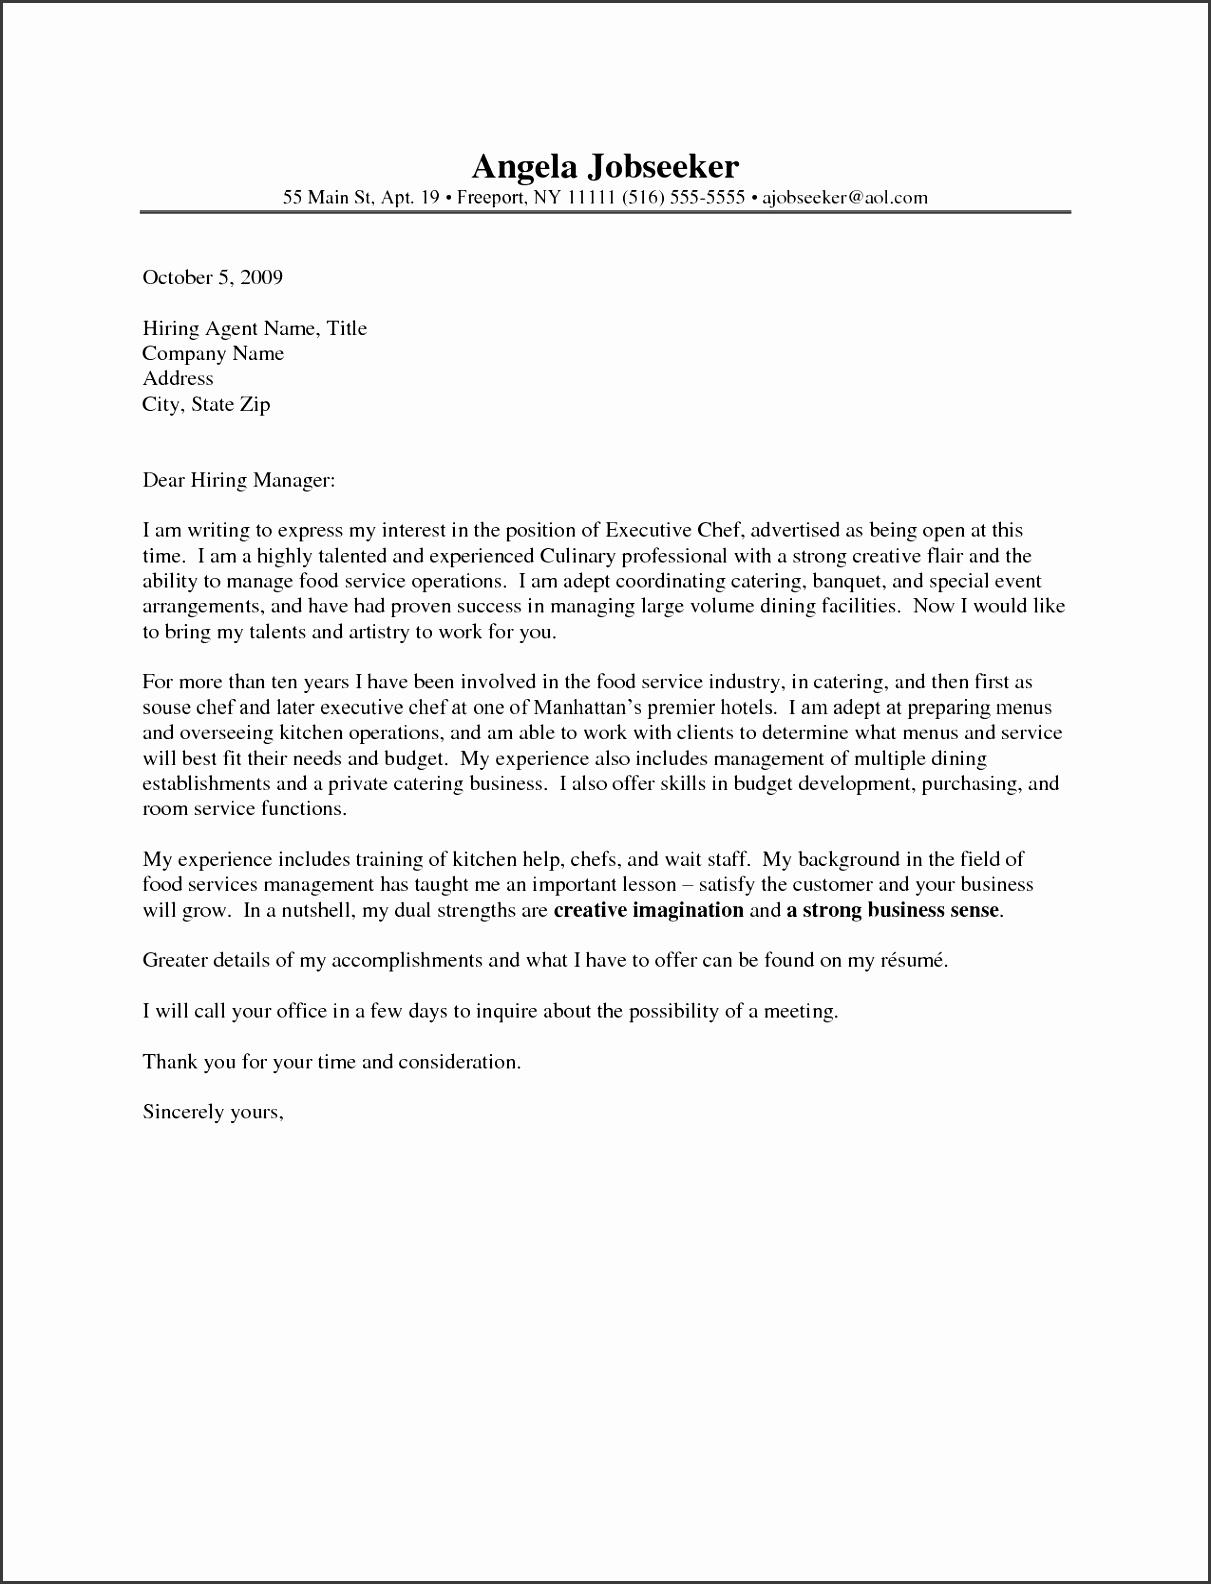 Gallery Microsoft Word Resignation Letter Template 4 Microsoft Word Letter Template Memo Formats Microsoft Word